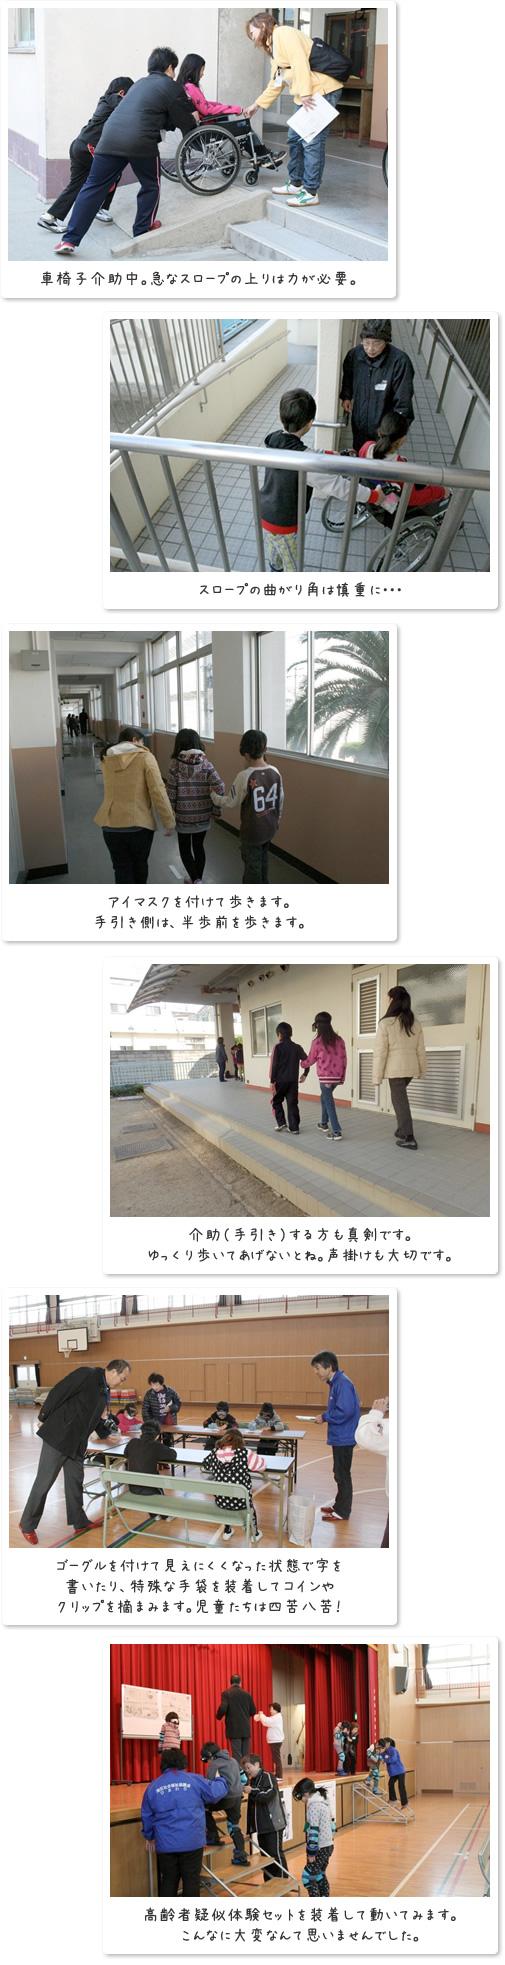 20141208_1_img01.jpg